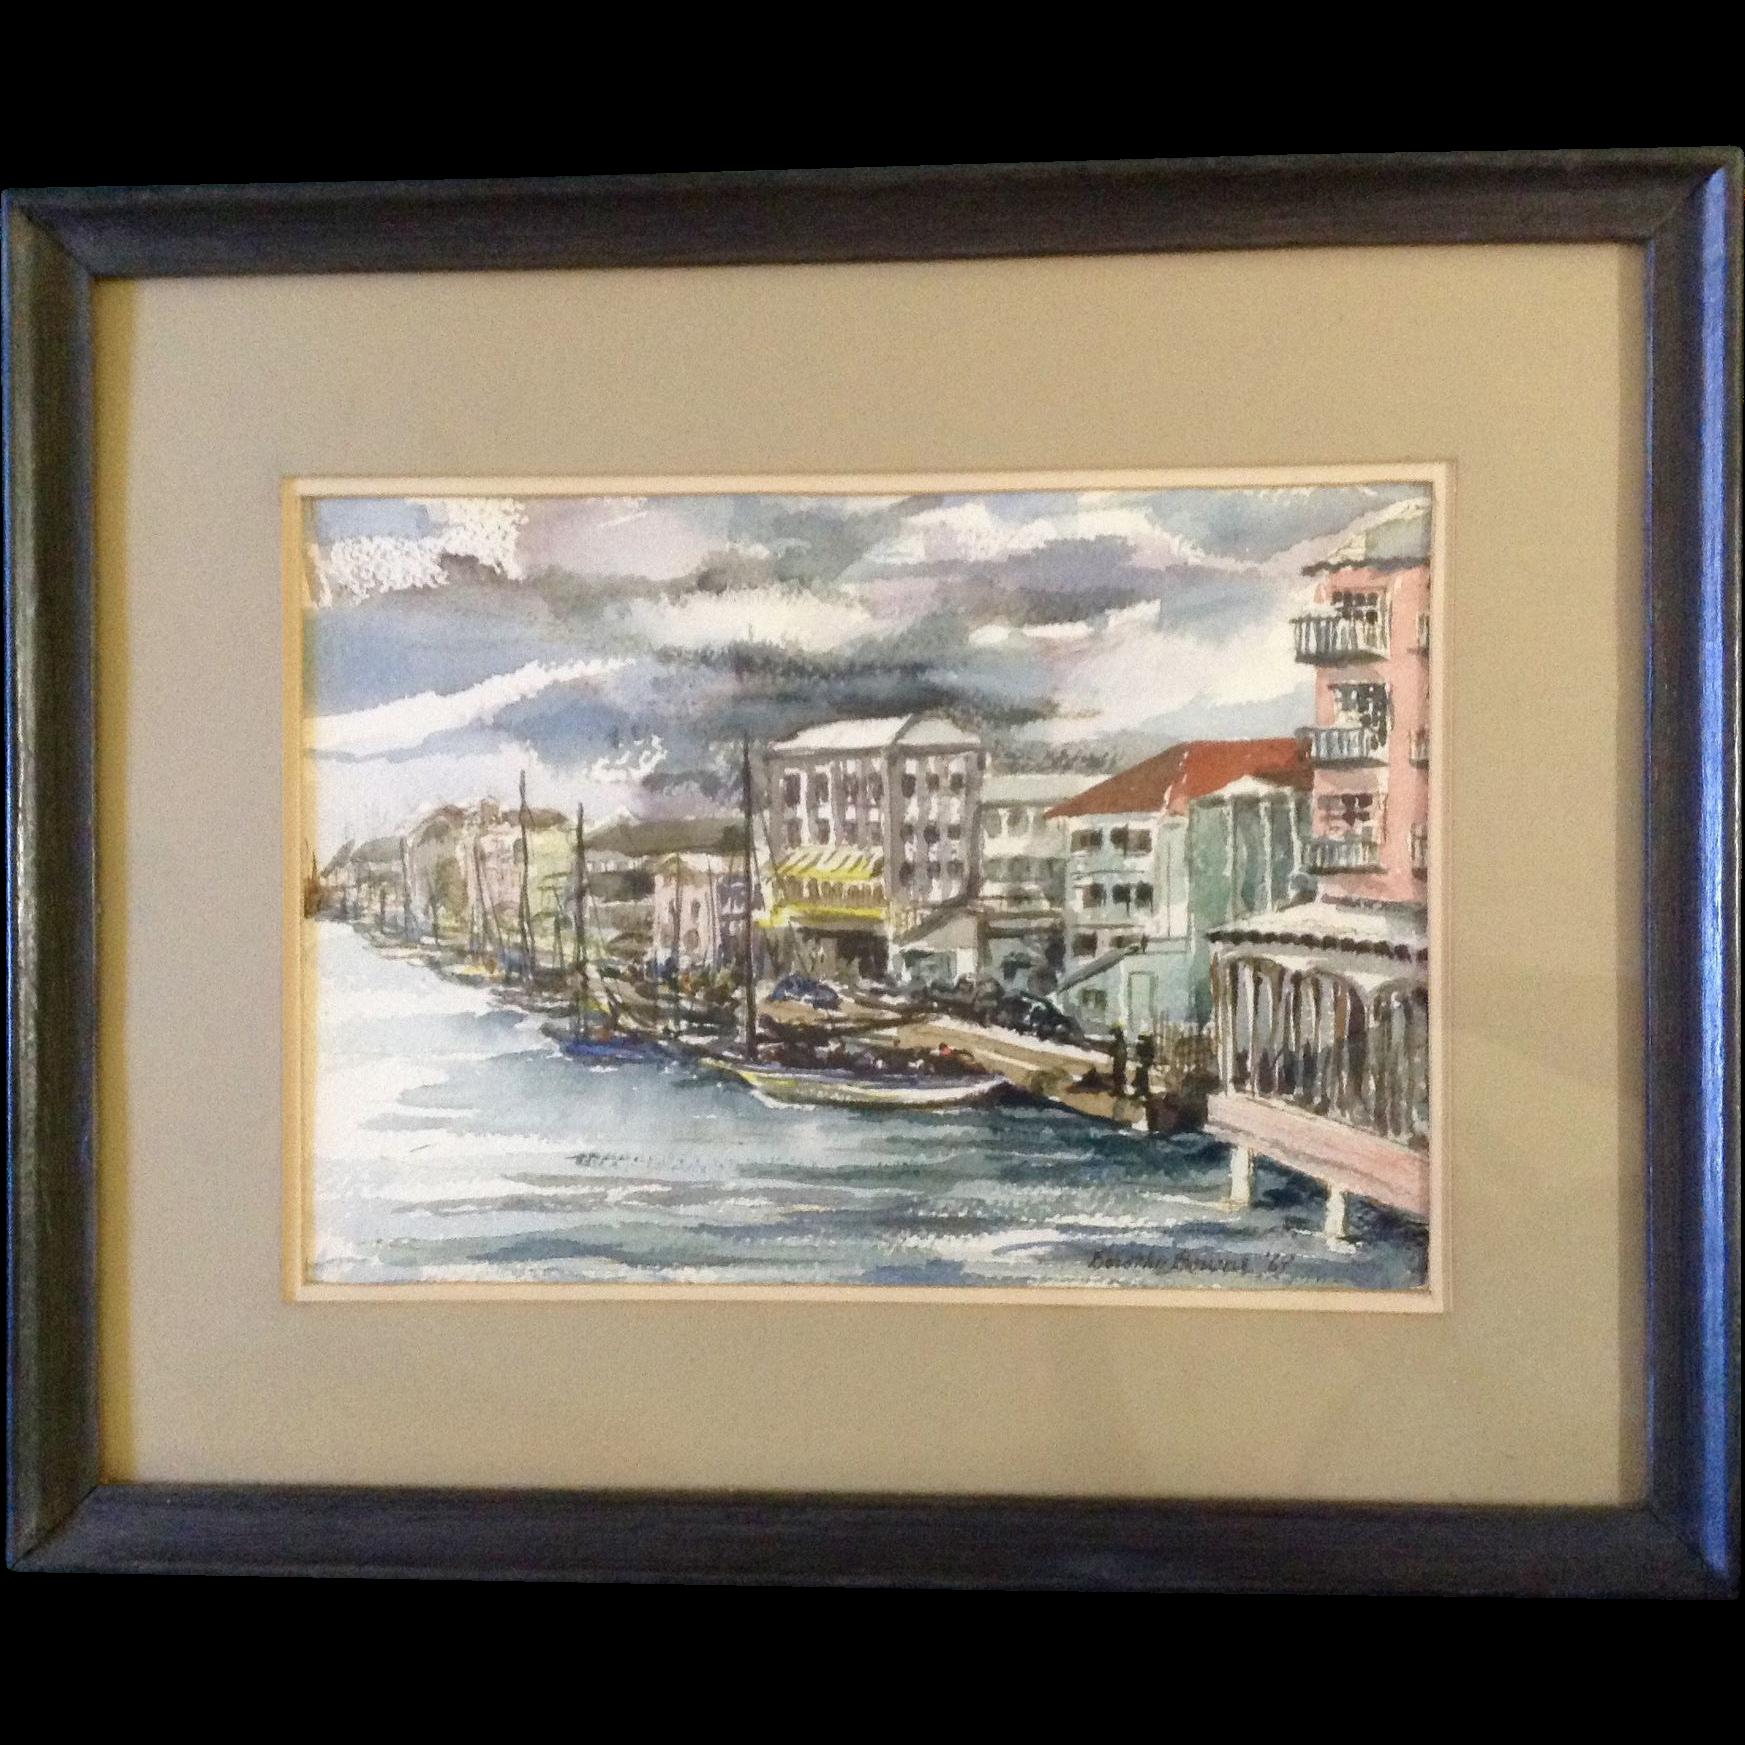 dorothy bourne painting wharf street nassau bahamas